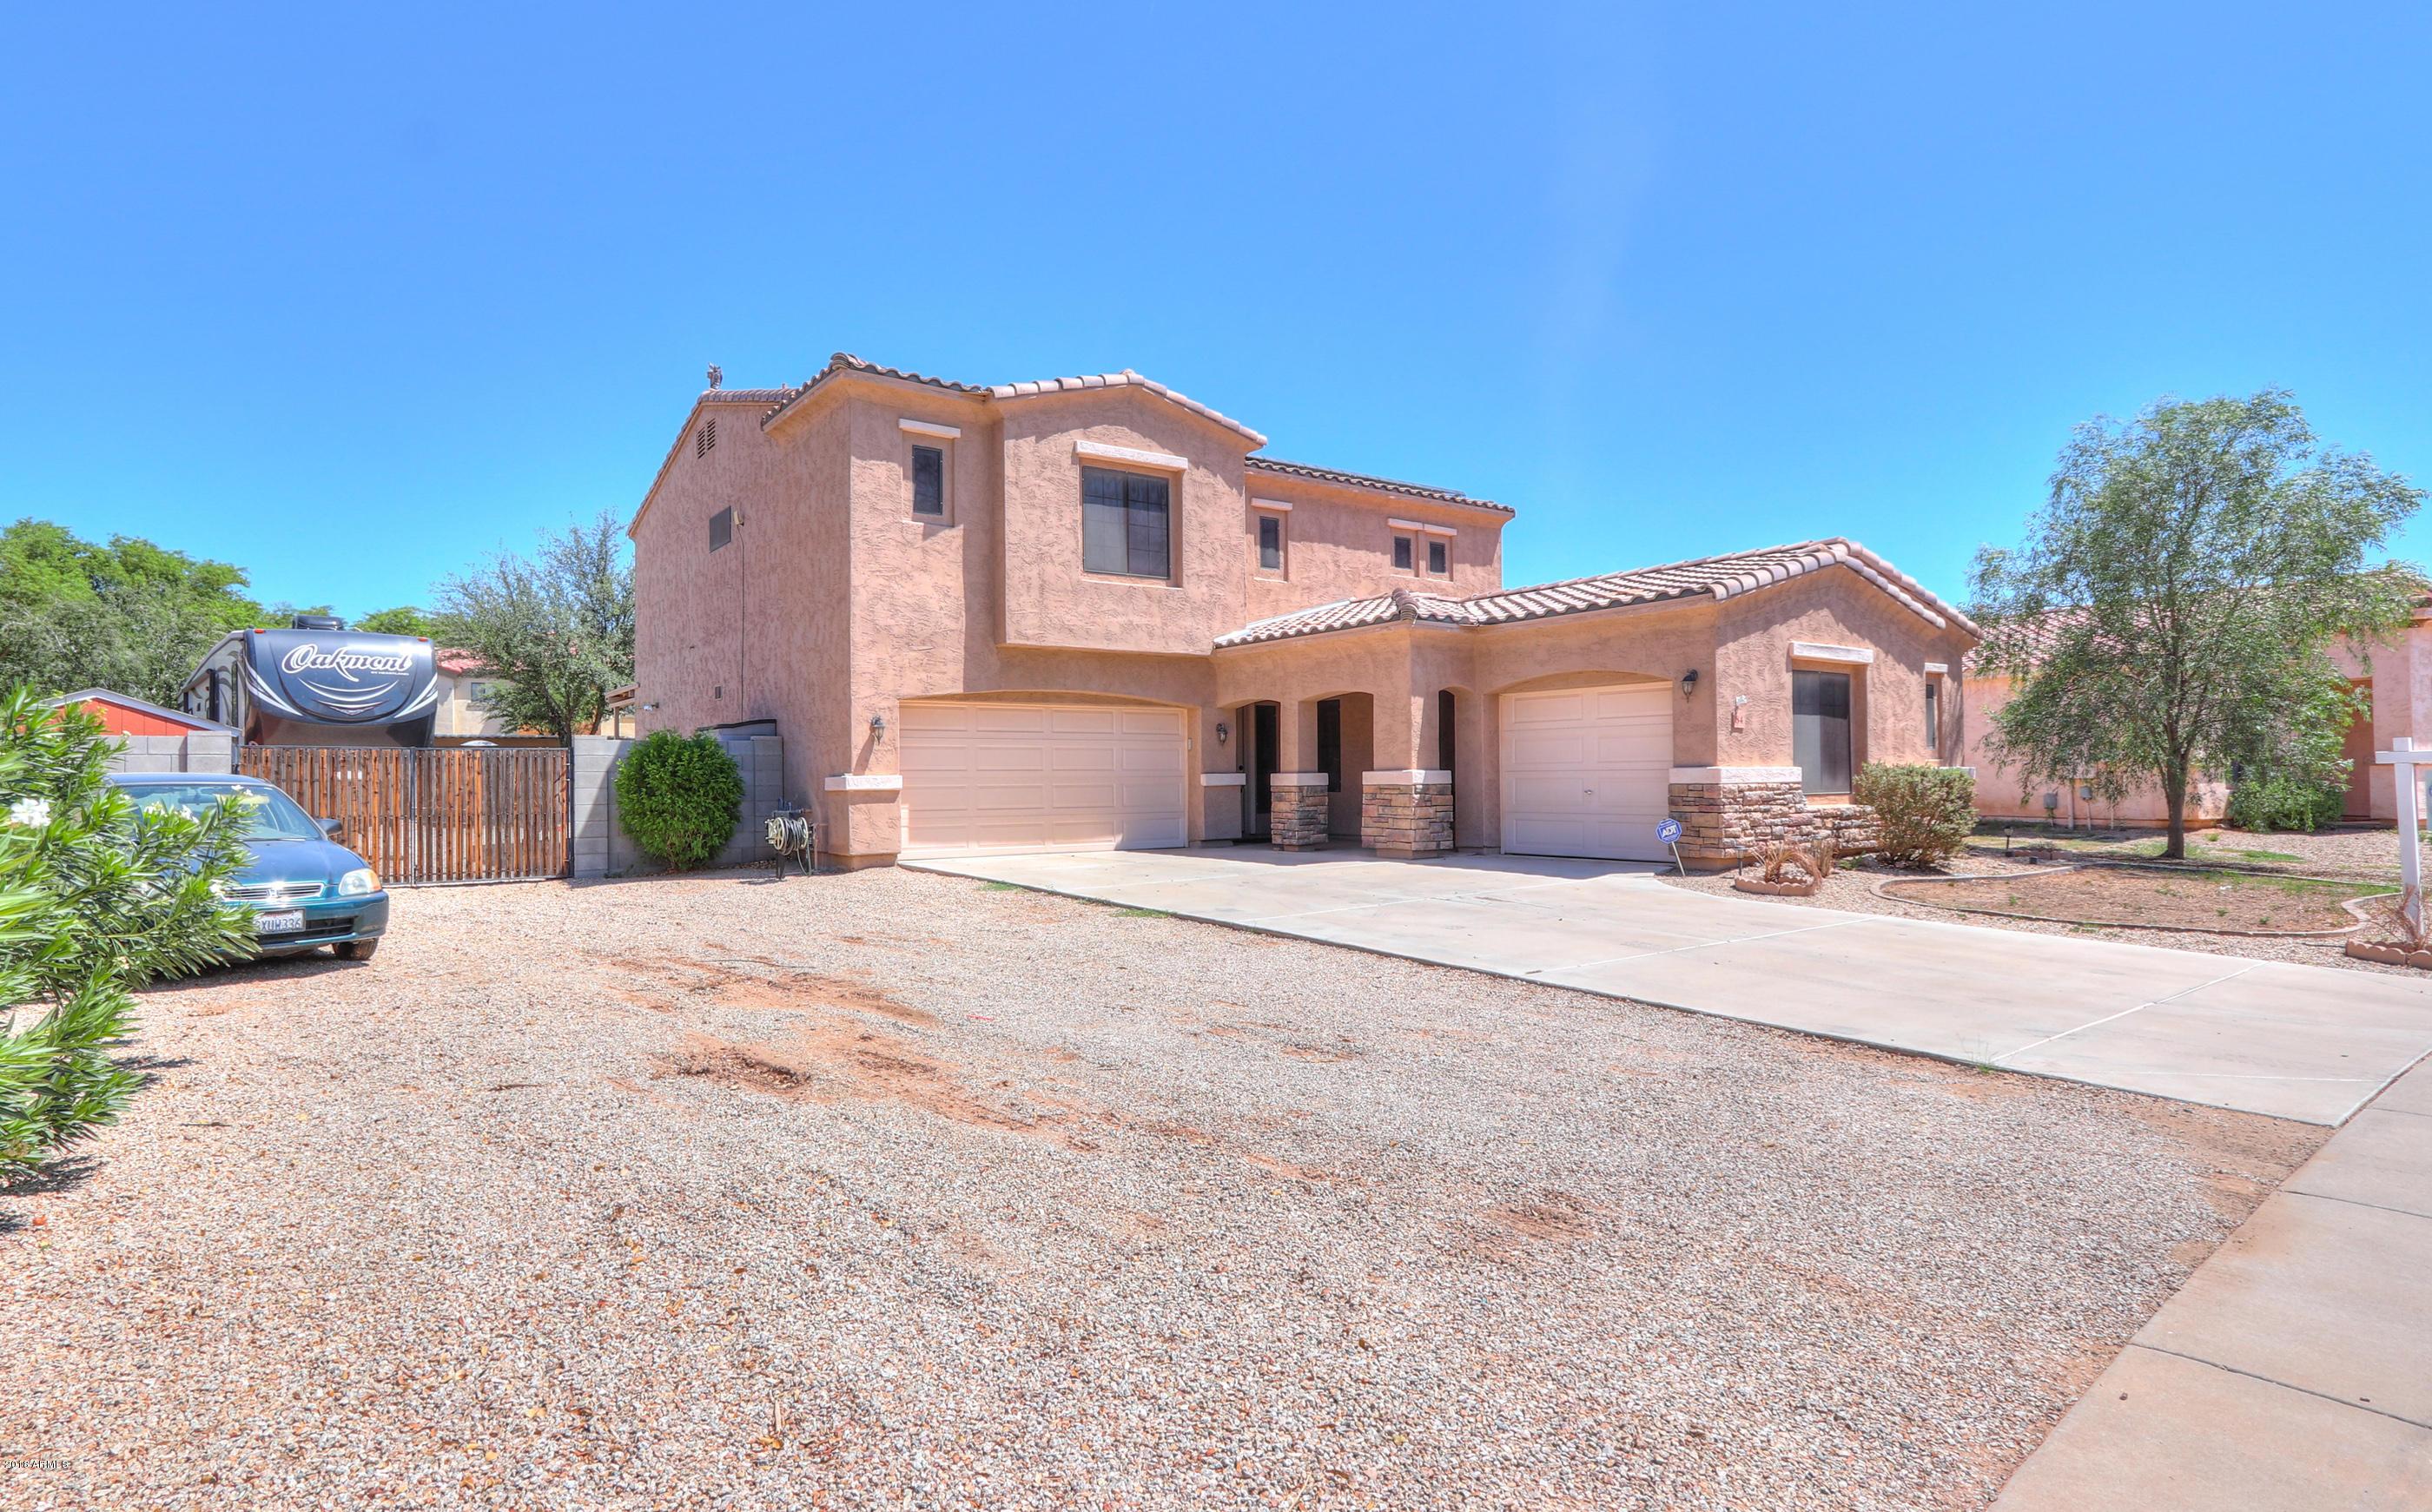 Photo for 84 N Southfork Drive, Casa Grande, AZ 85122 (MLS # 5820478)